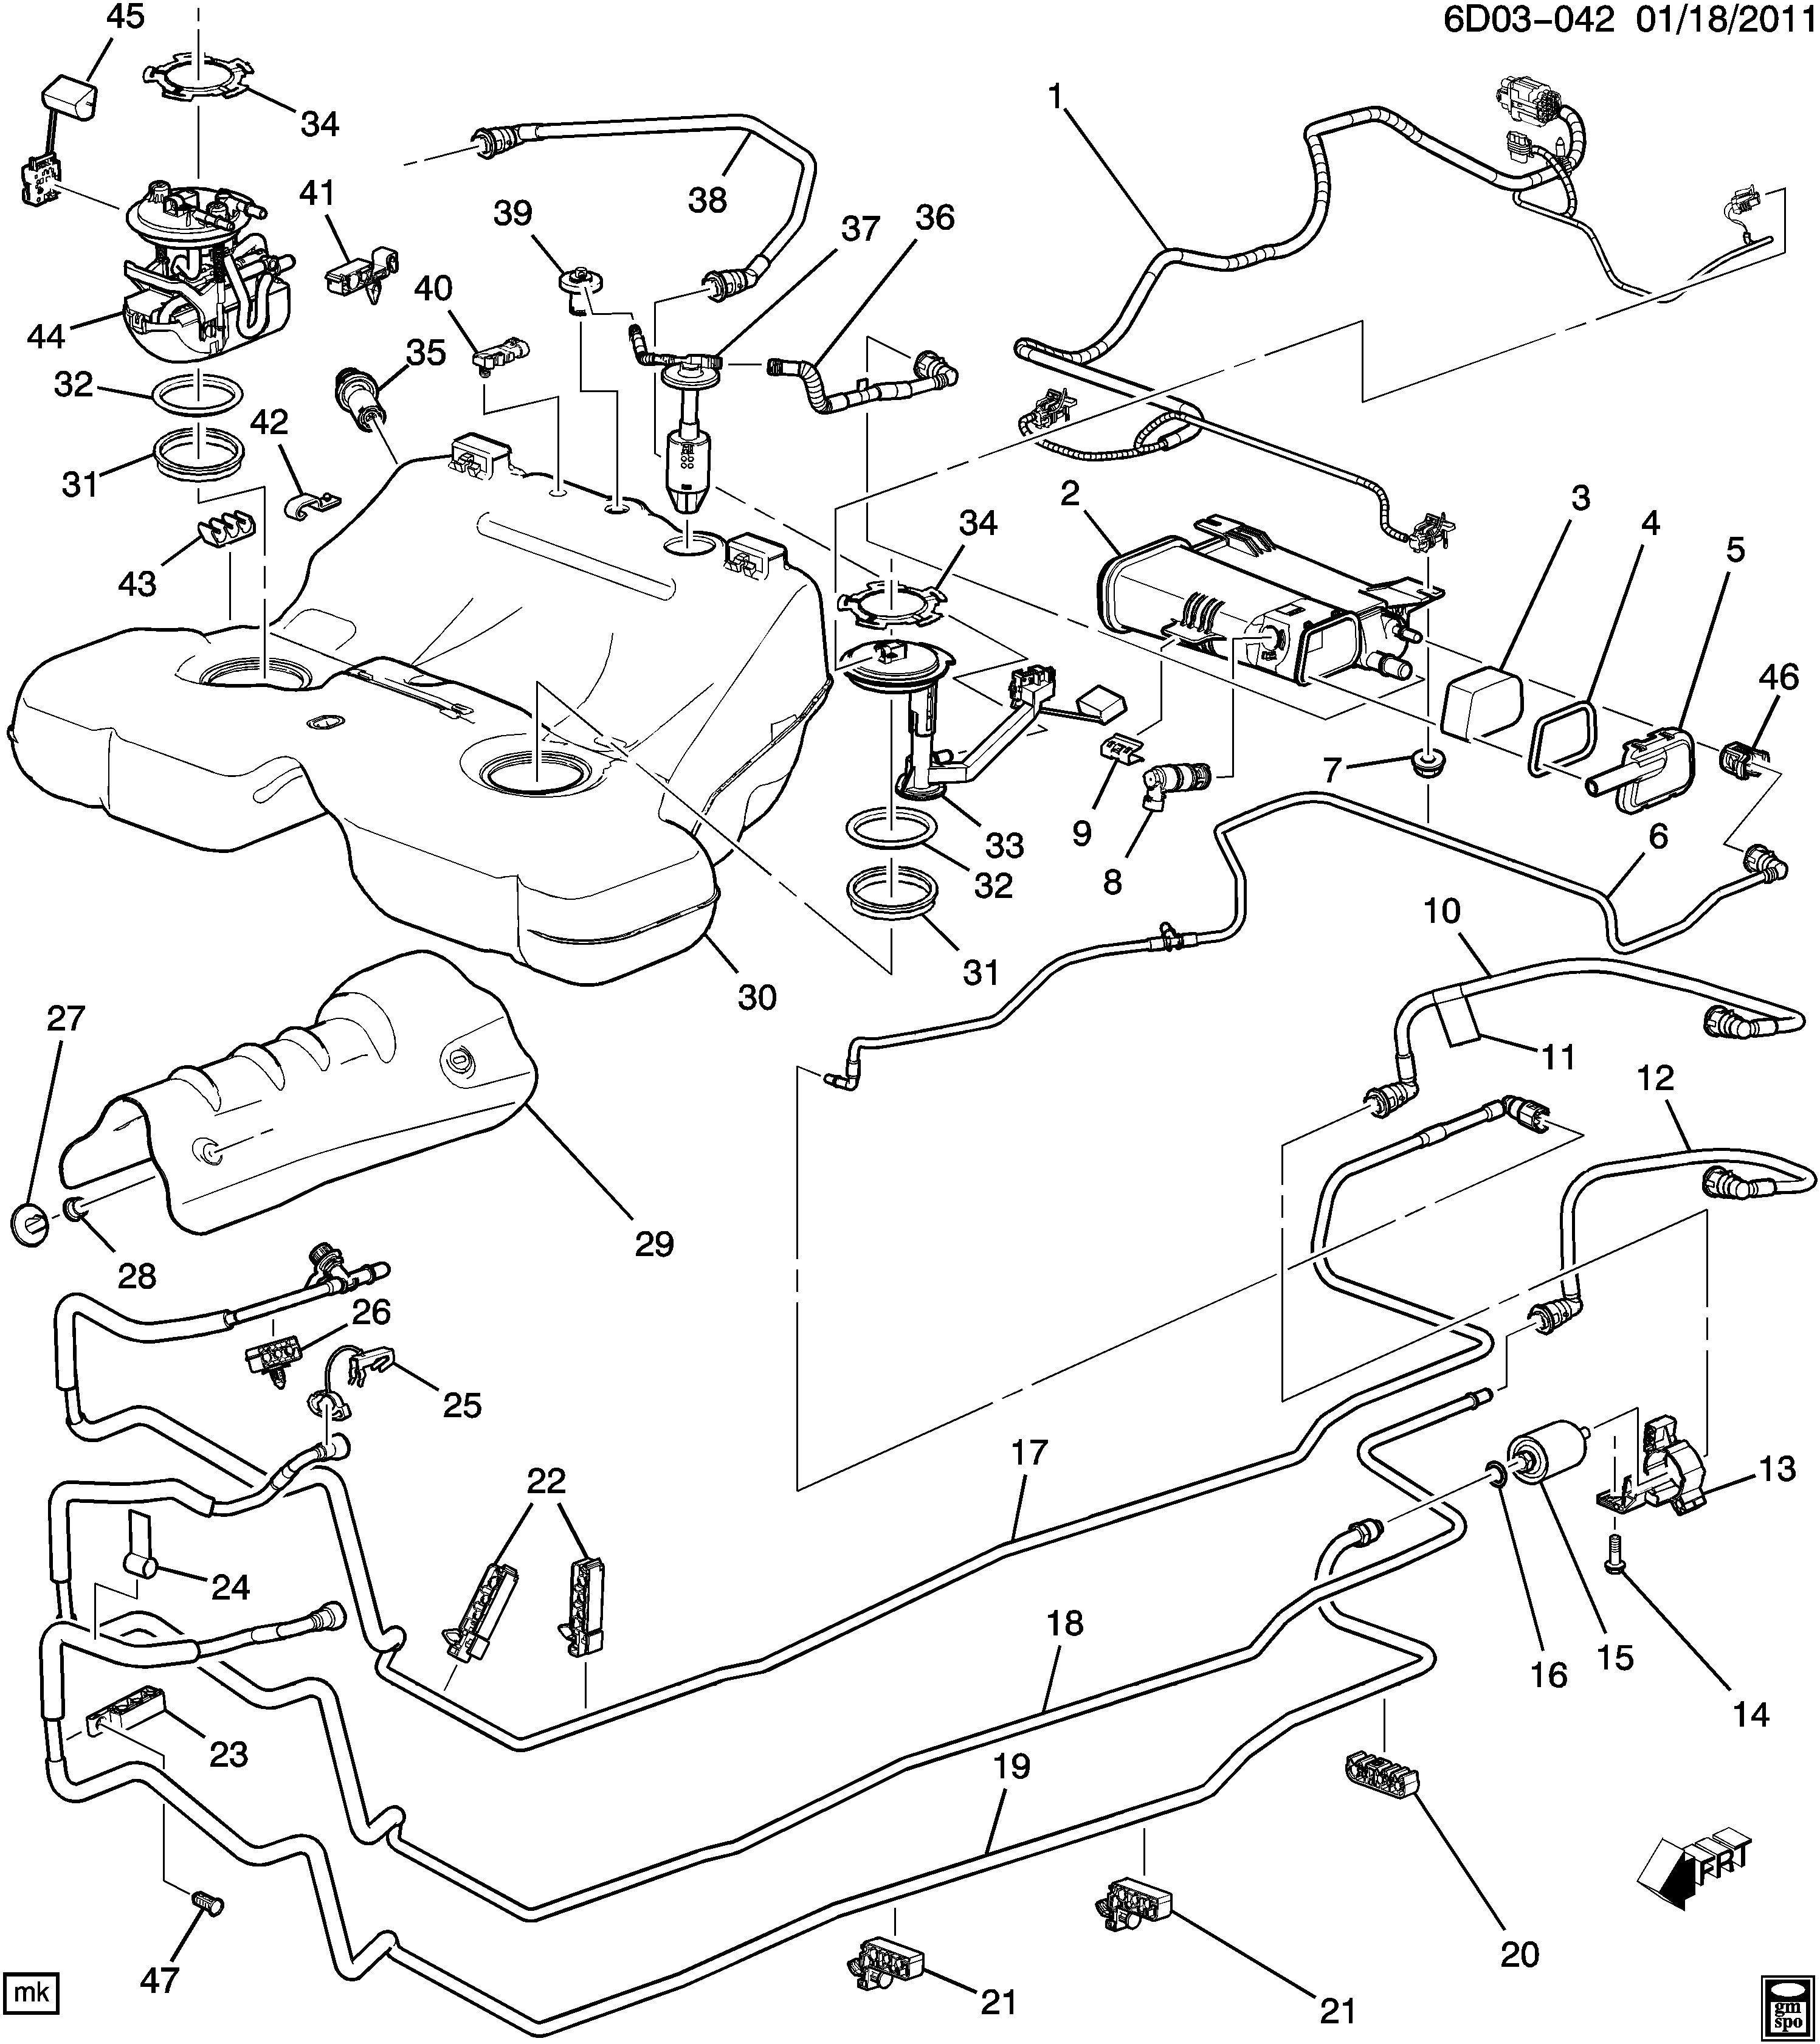 2003 cadillac cts fuel tank auto pinterest cadillac cts and rh pinterest 2008 cadillac cts parts diagram 2008 cadillac cts parts diagram